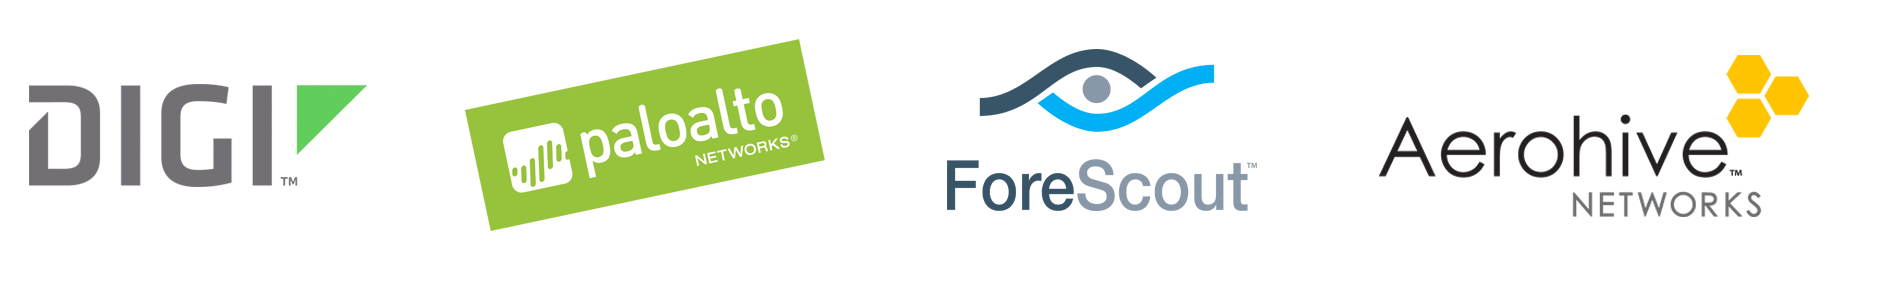 logos_fournisseurs